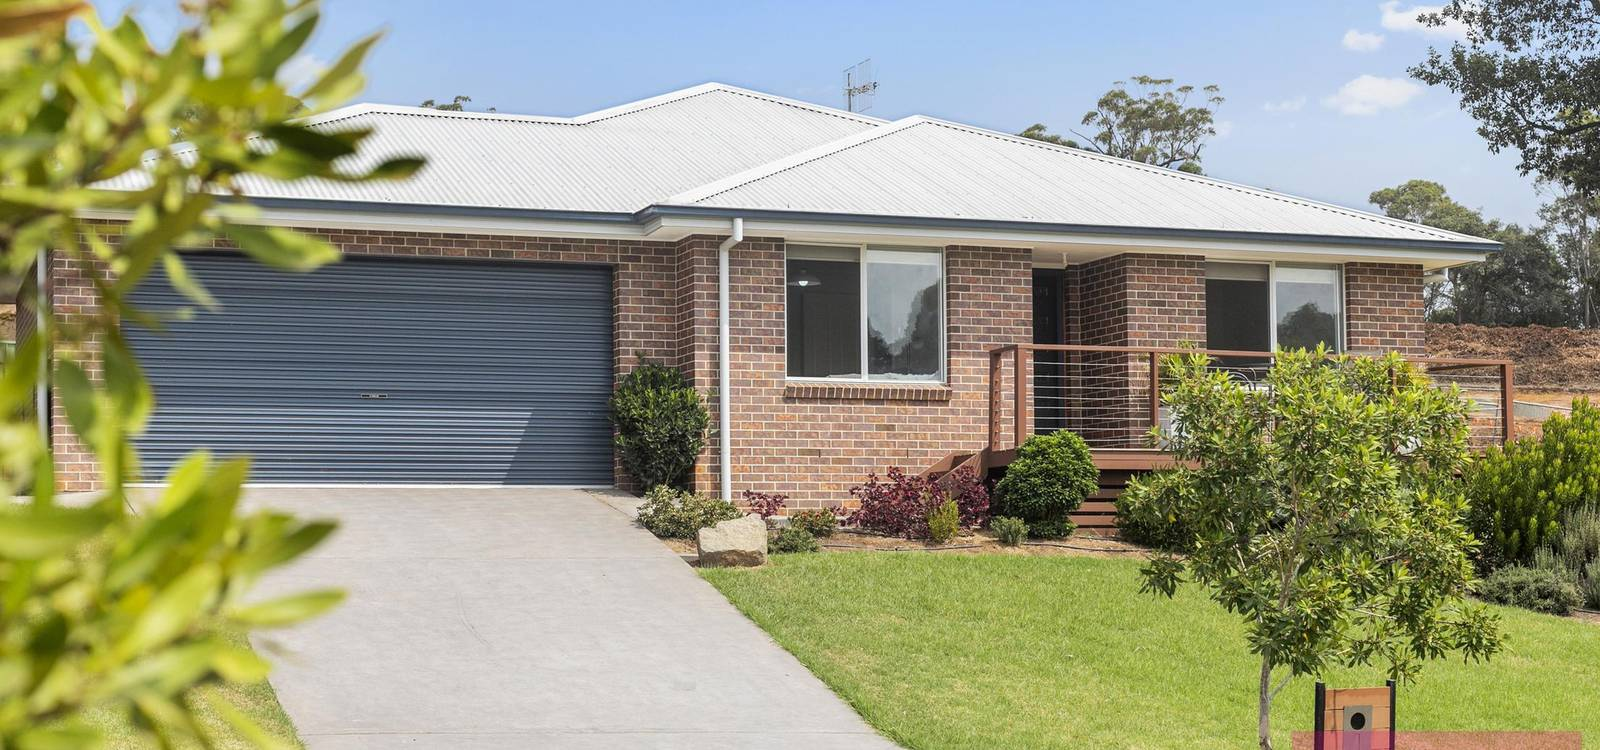 44 Molloy Street MOLLYMOOK, NSW 2539 - photo 1